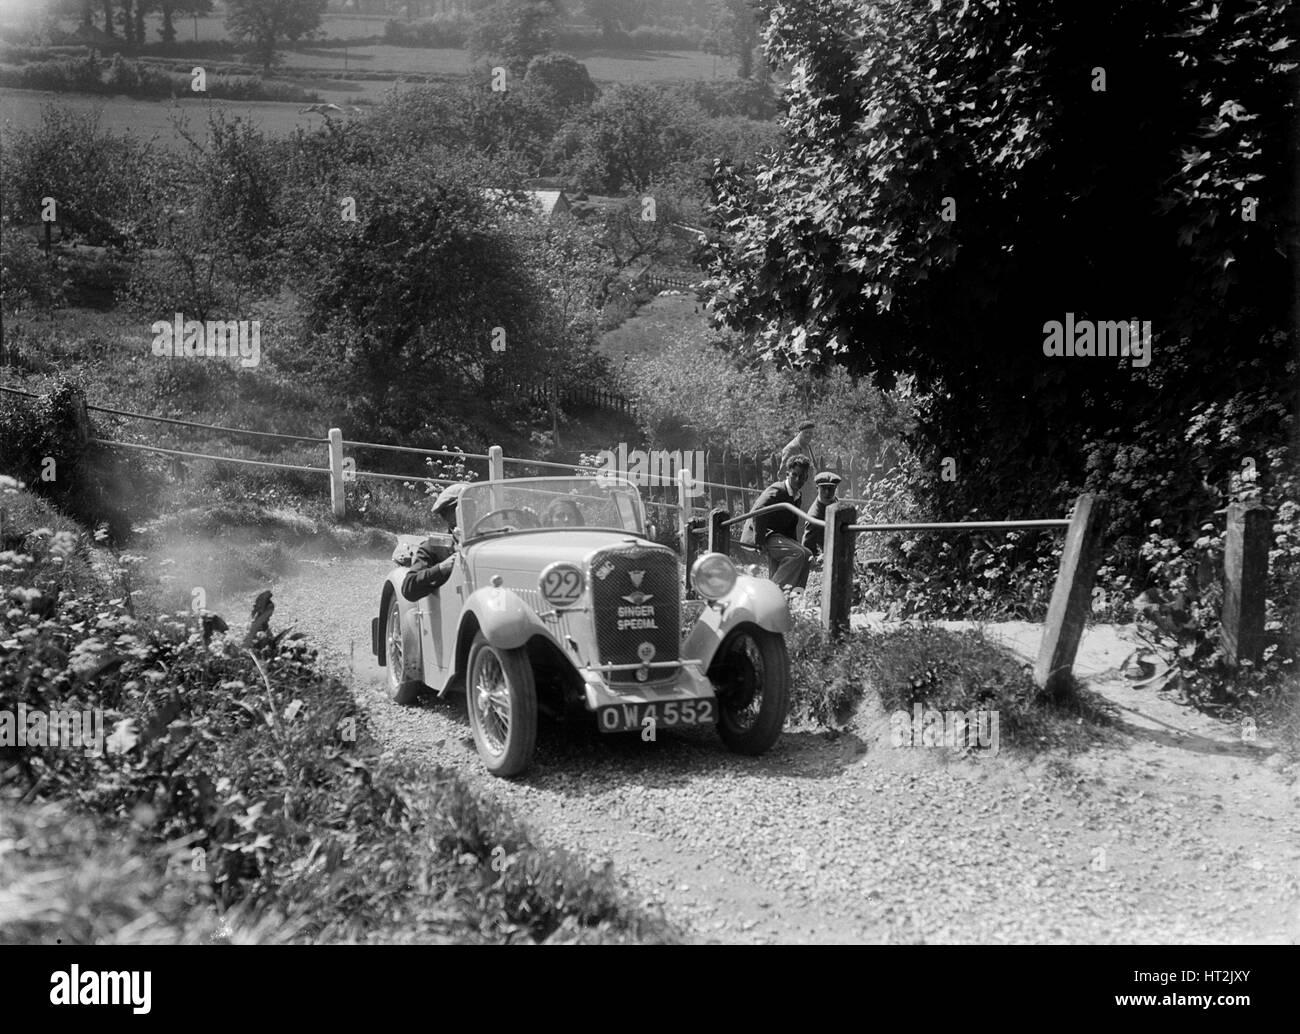 1934 Singer Le Mans taking part in a West Hants Light Car Club Trial, Ibberton Hill, Dorset, 1930s. Artist: Bill - Stock Image